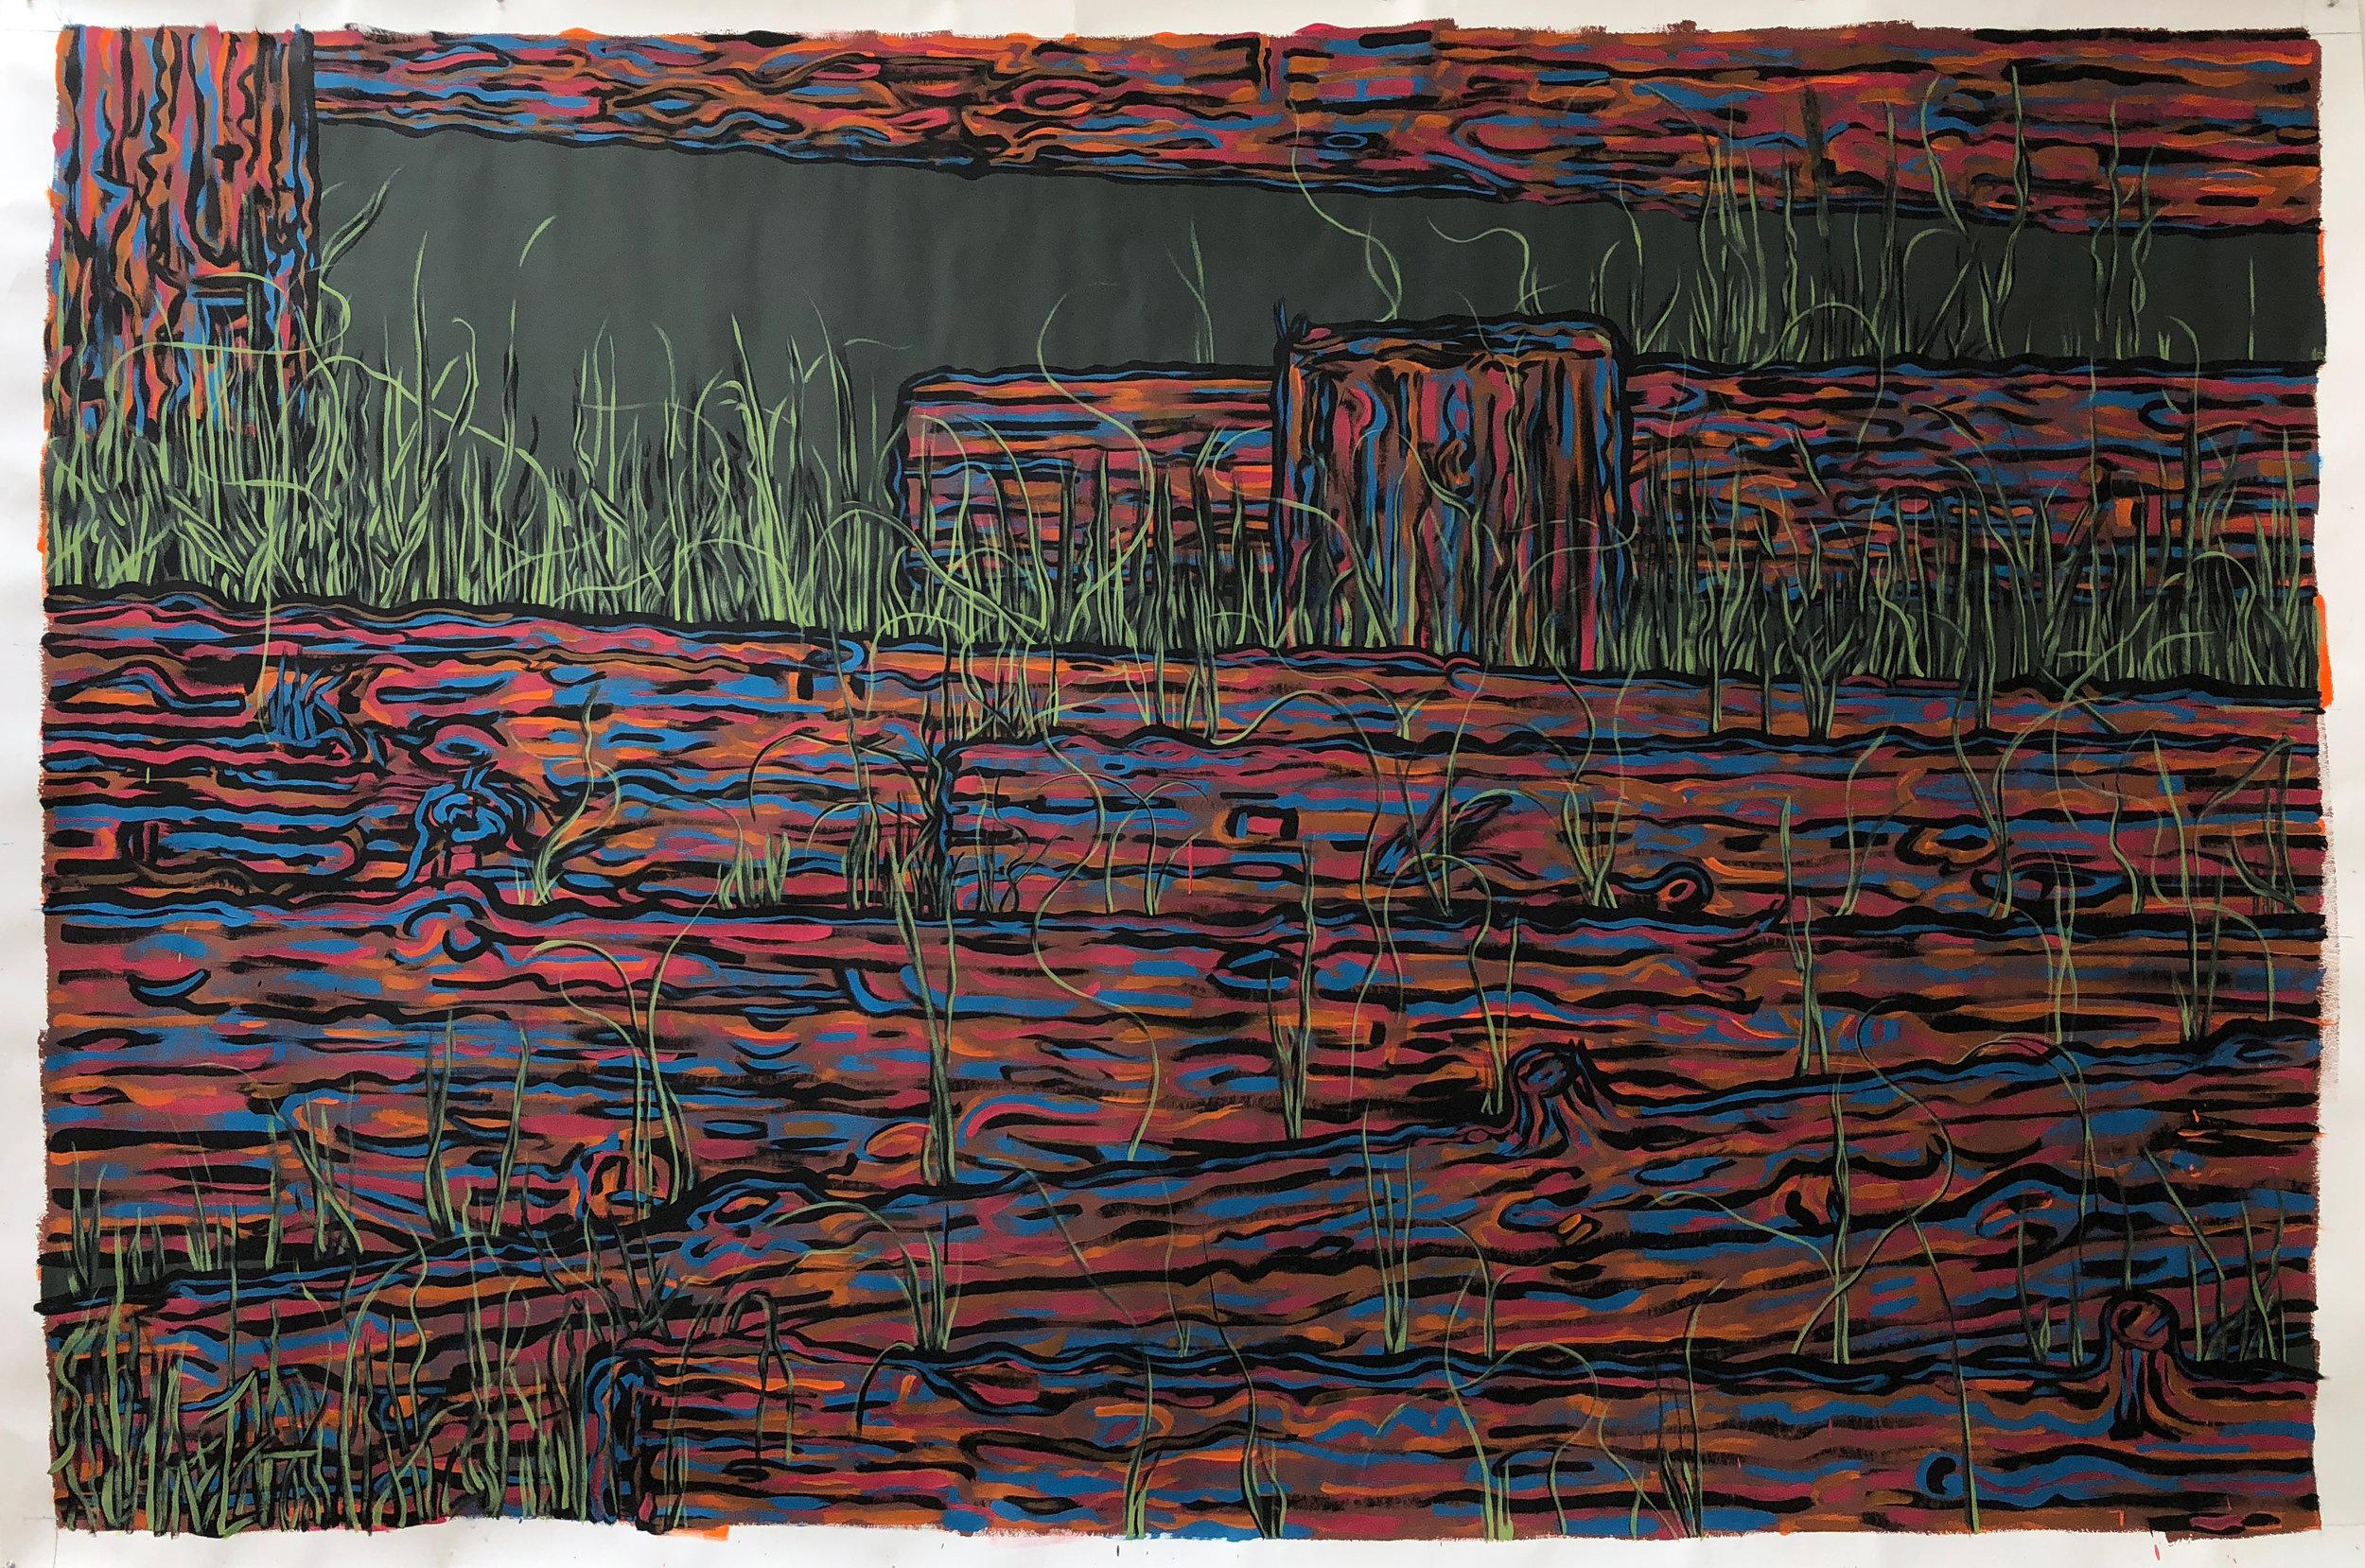 "Lot,   2018 aqua dispersion, tempera, and gesso on paper, 72"" x 106"""